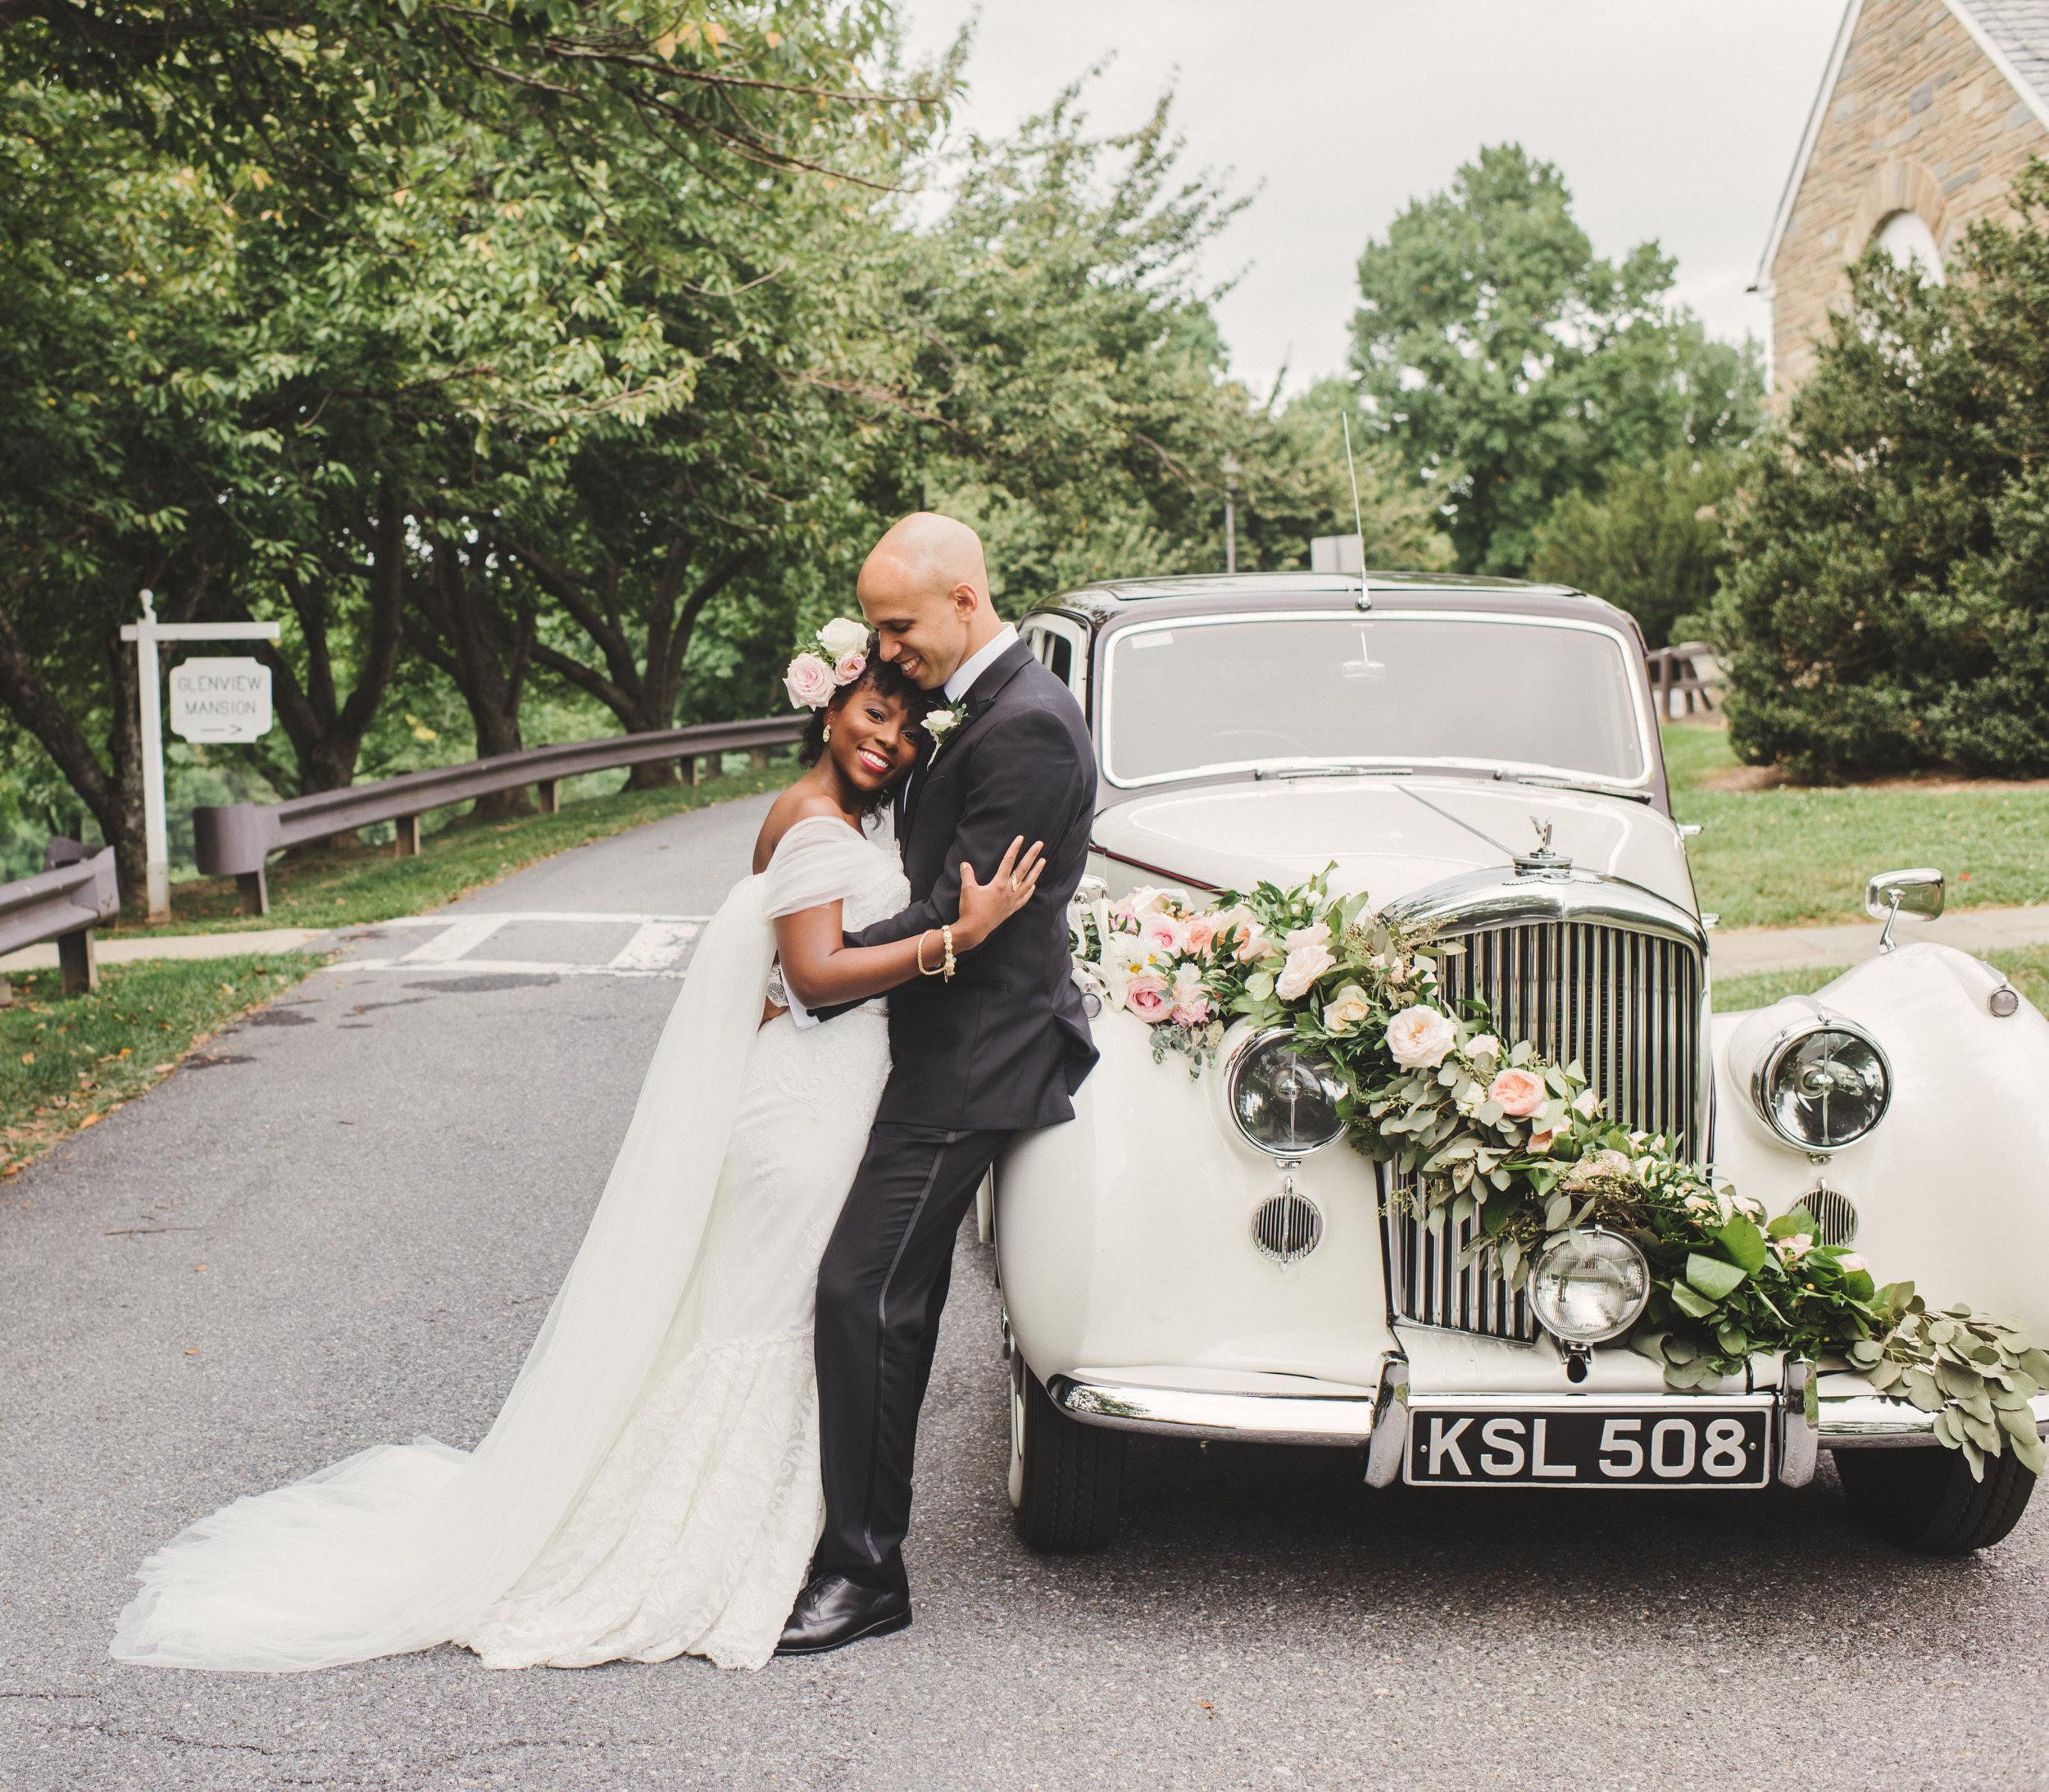 GLENVIEW MANSION WEDDING - INTIMATE WEDDING PHOTOGRAPHER - TWOTWENTY by CHI-CHI AGBIM-188.jpg